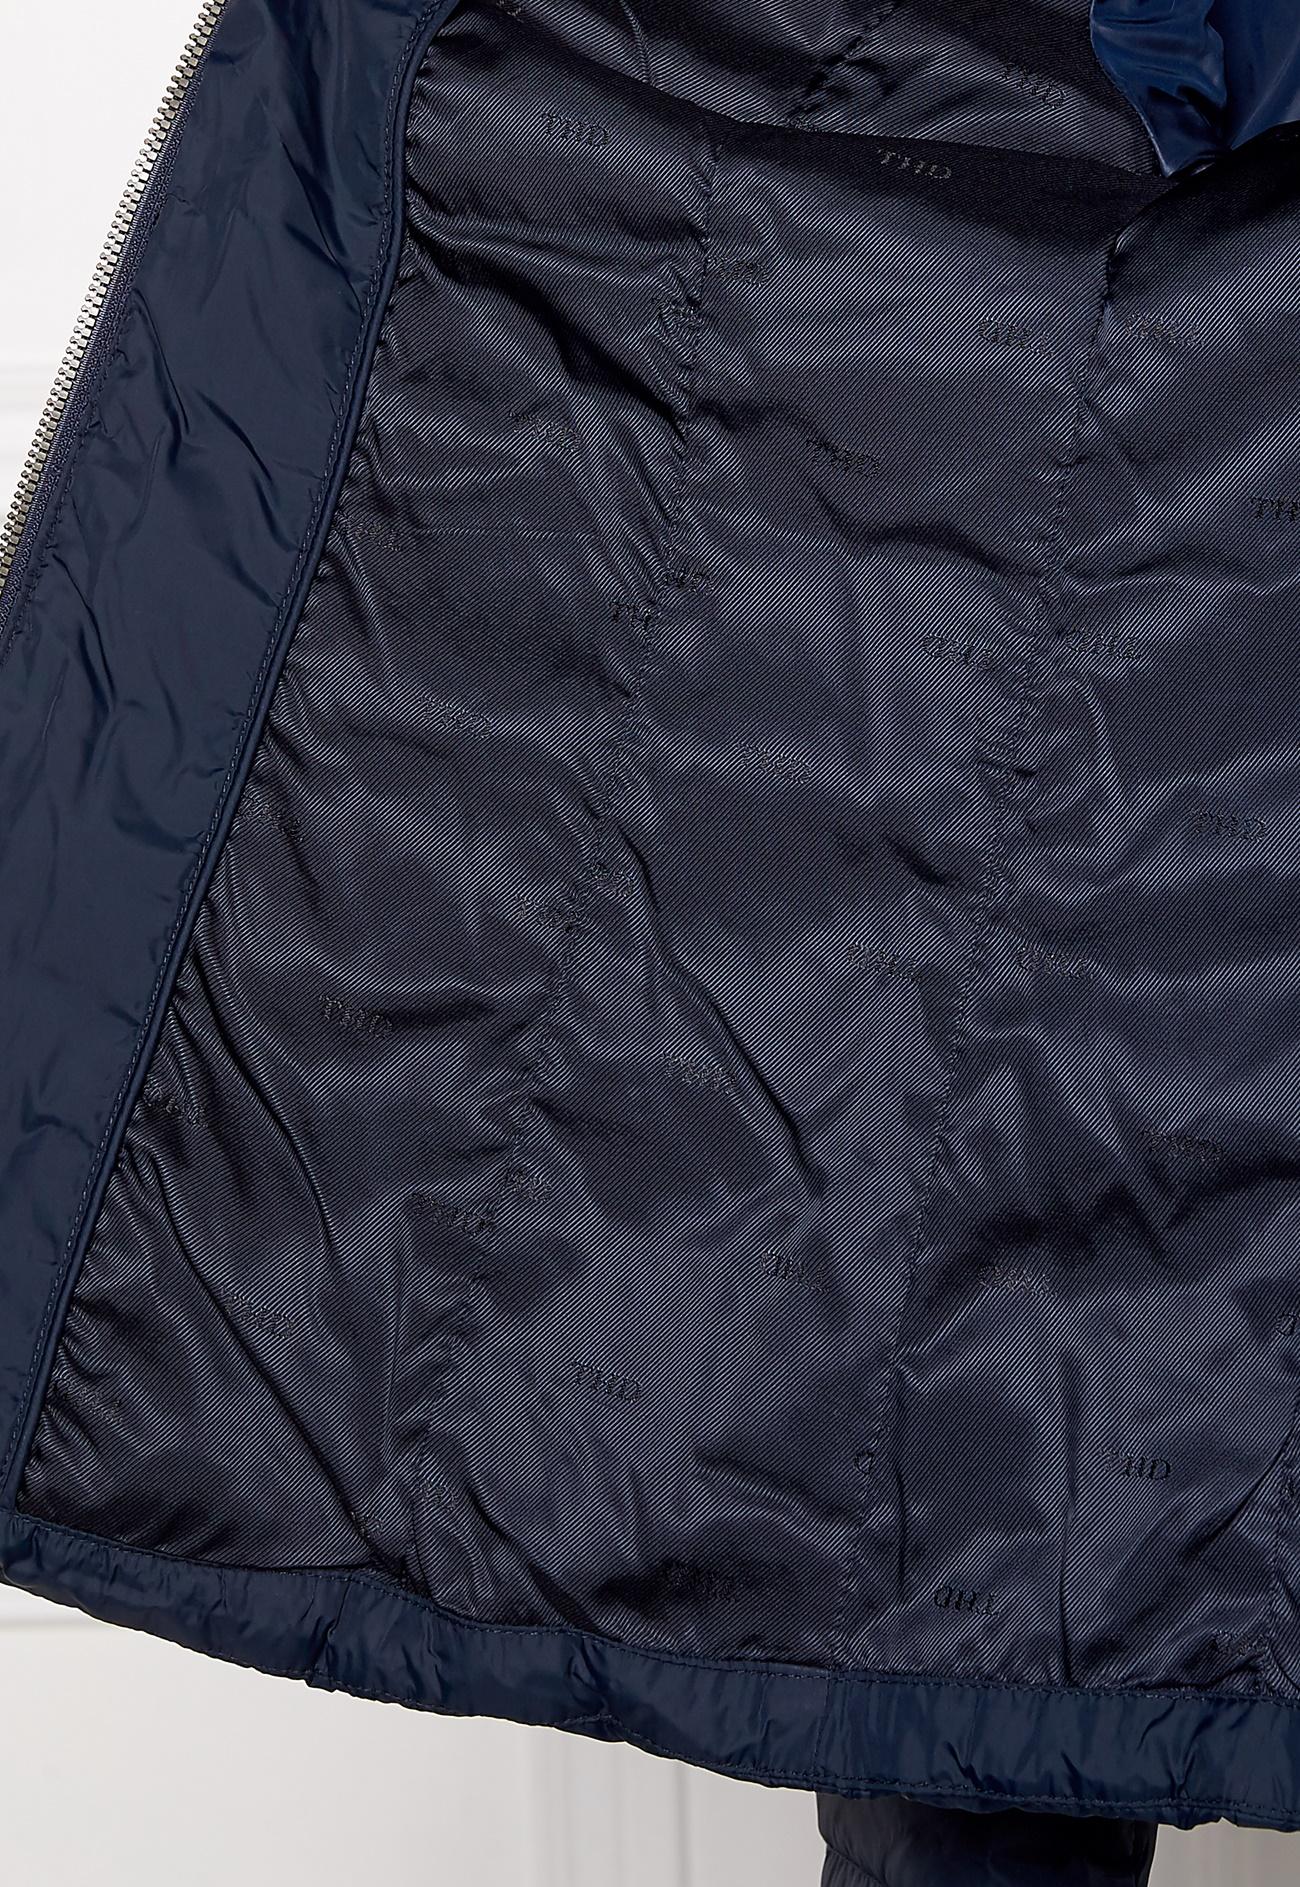 Tommy Hilfiger Bubble Jacket